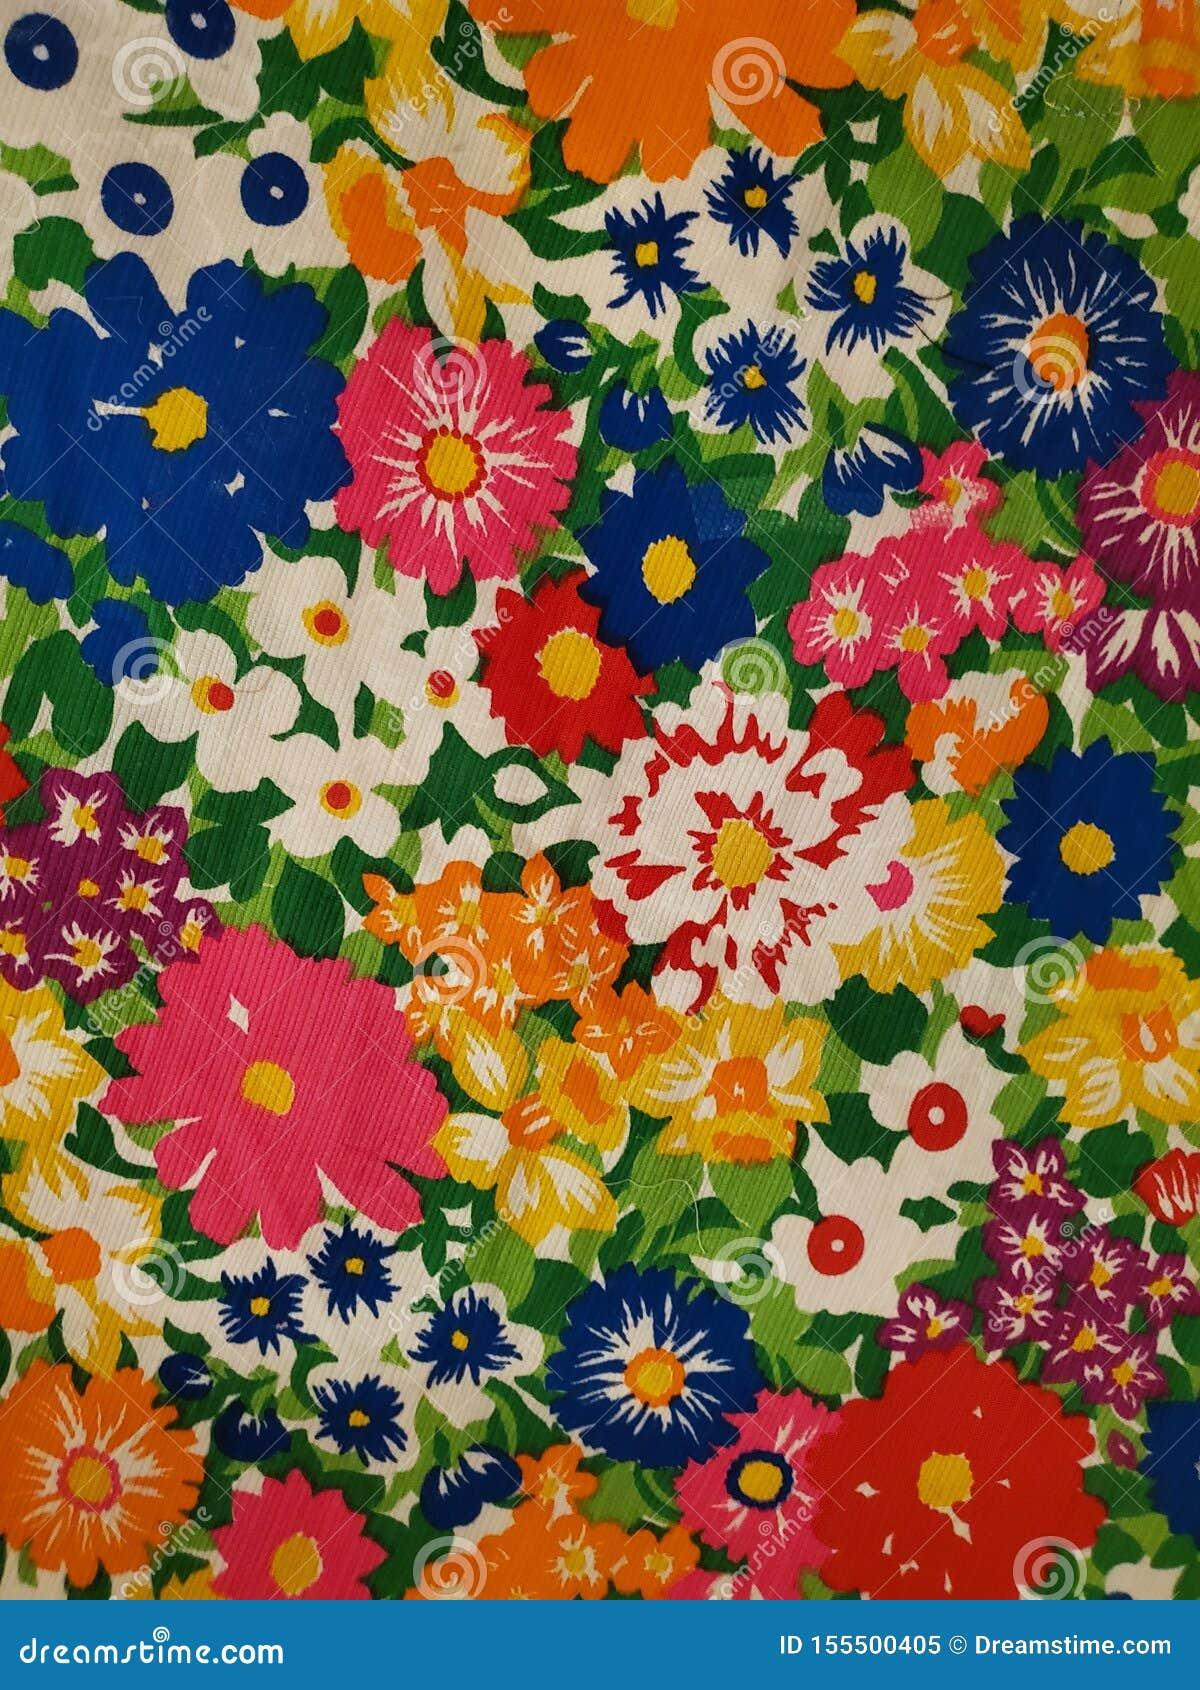 Vintage Floral Pattern Fabric 70s Decor Design Wallpaper Stock